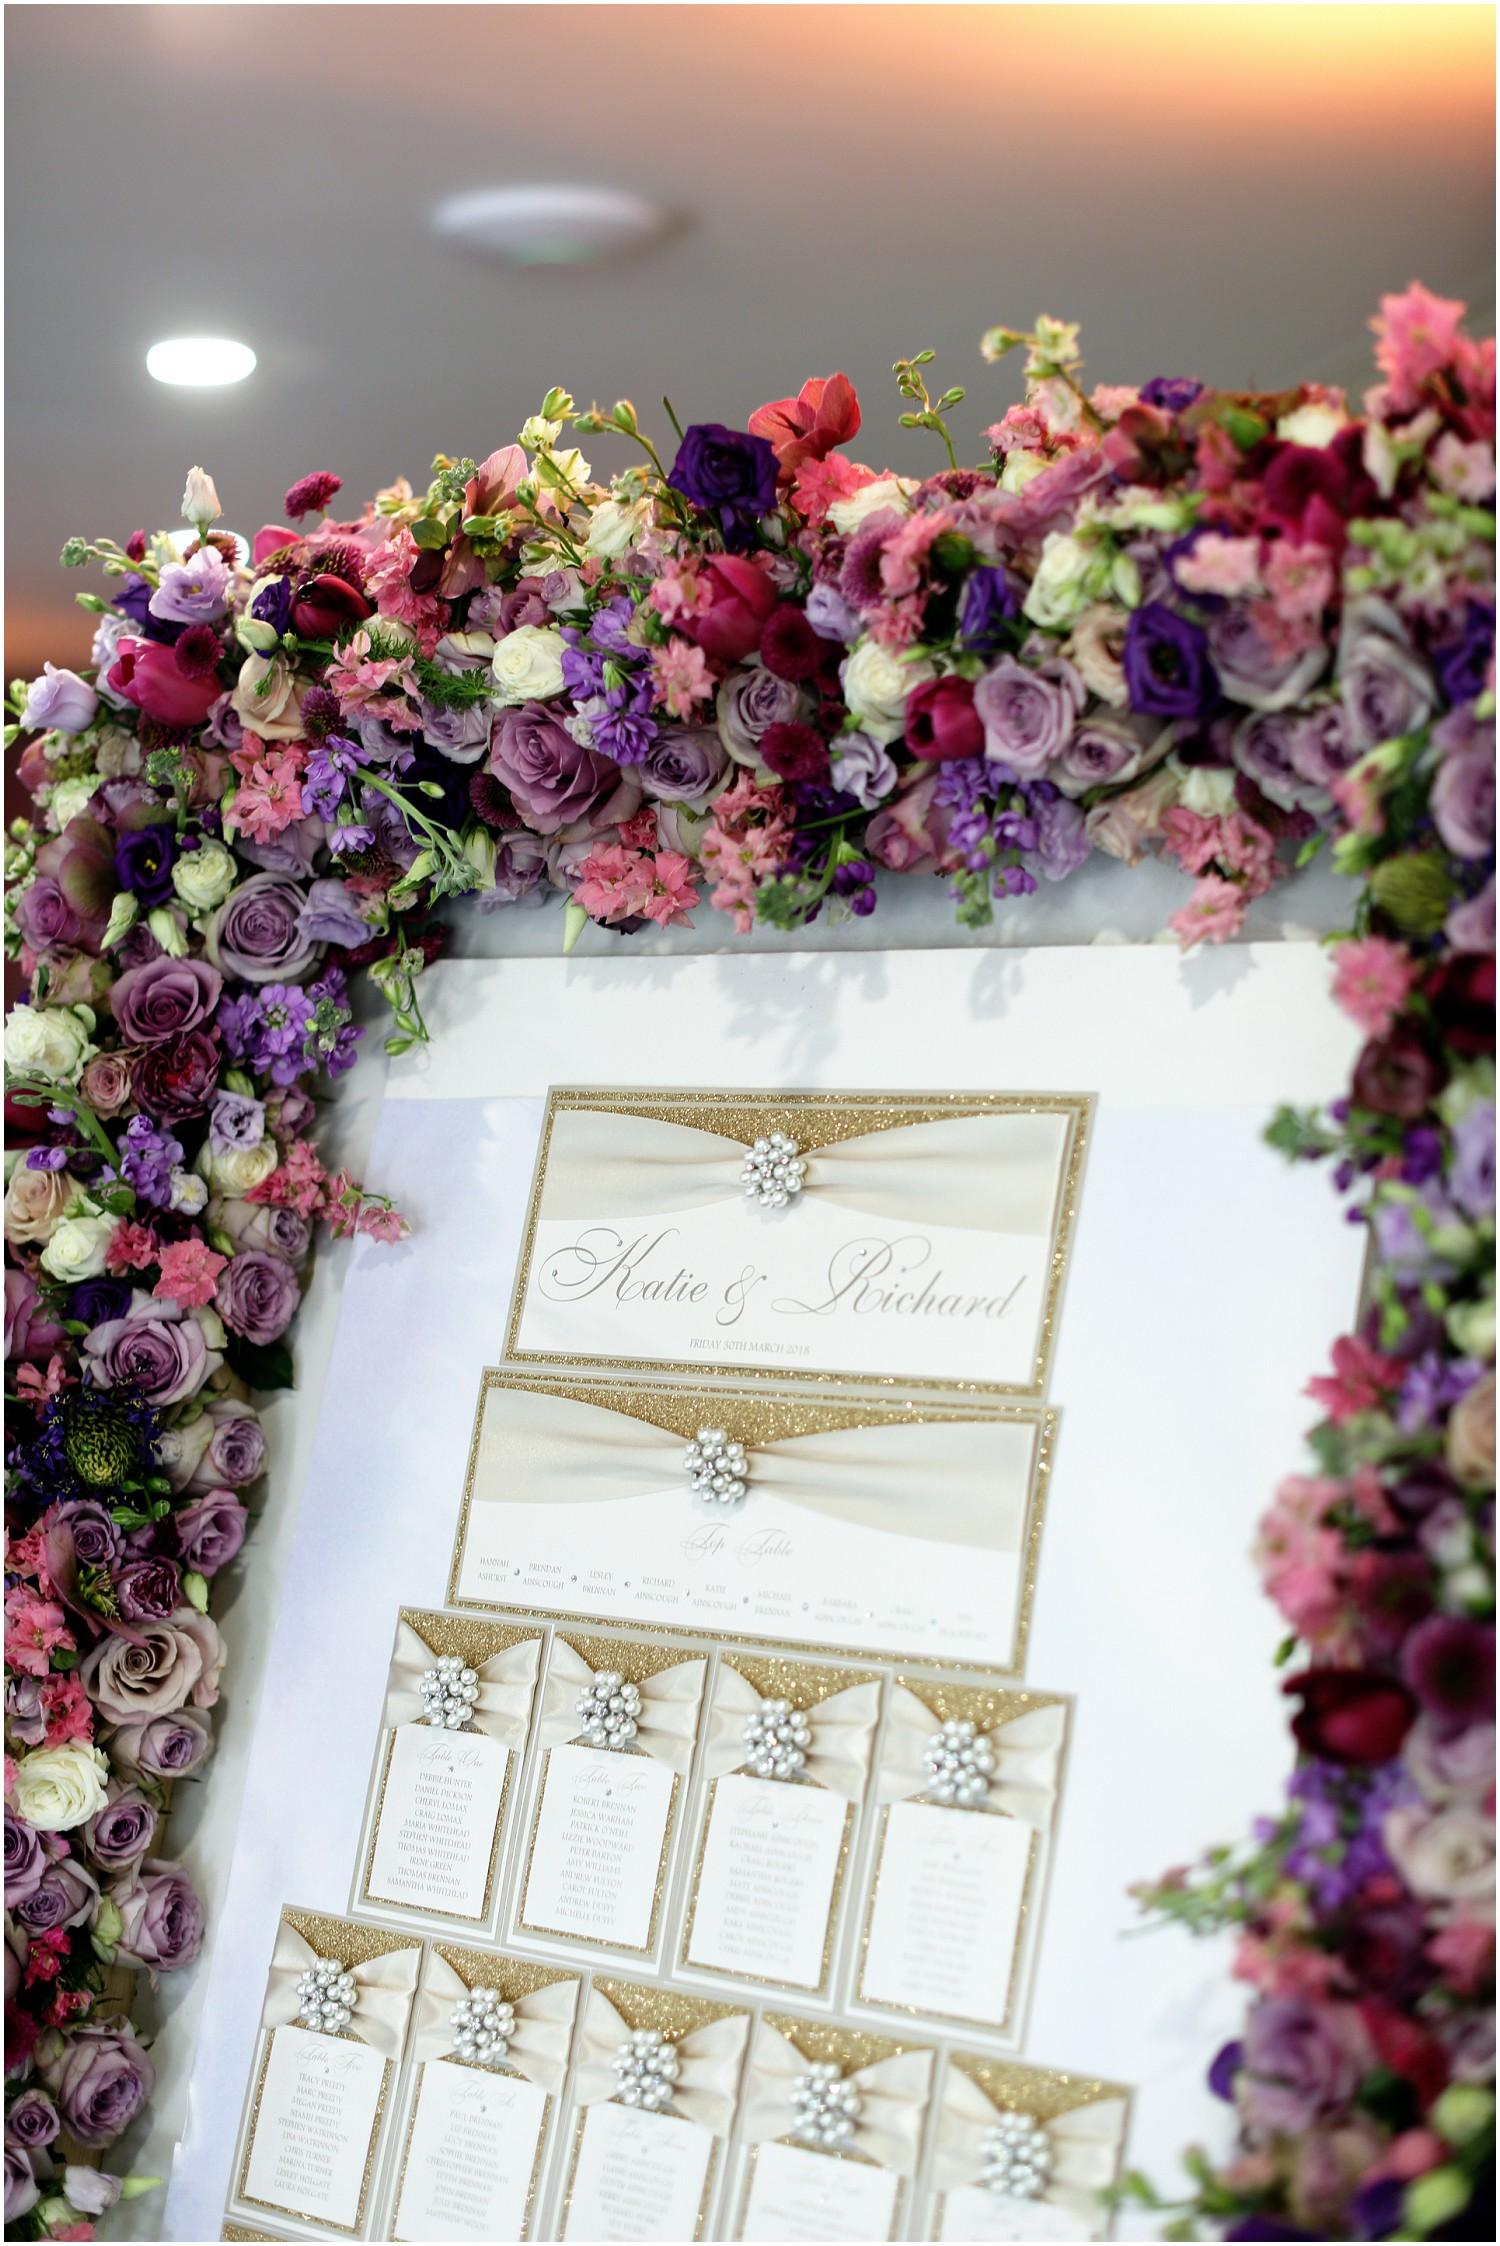 wedding breakfast table plan